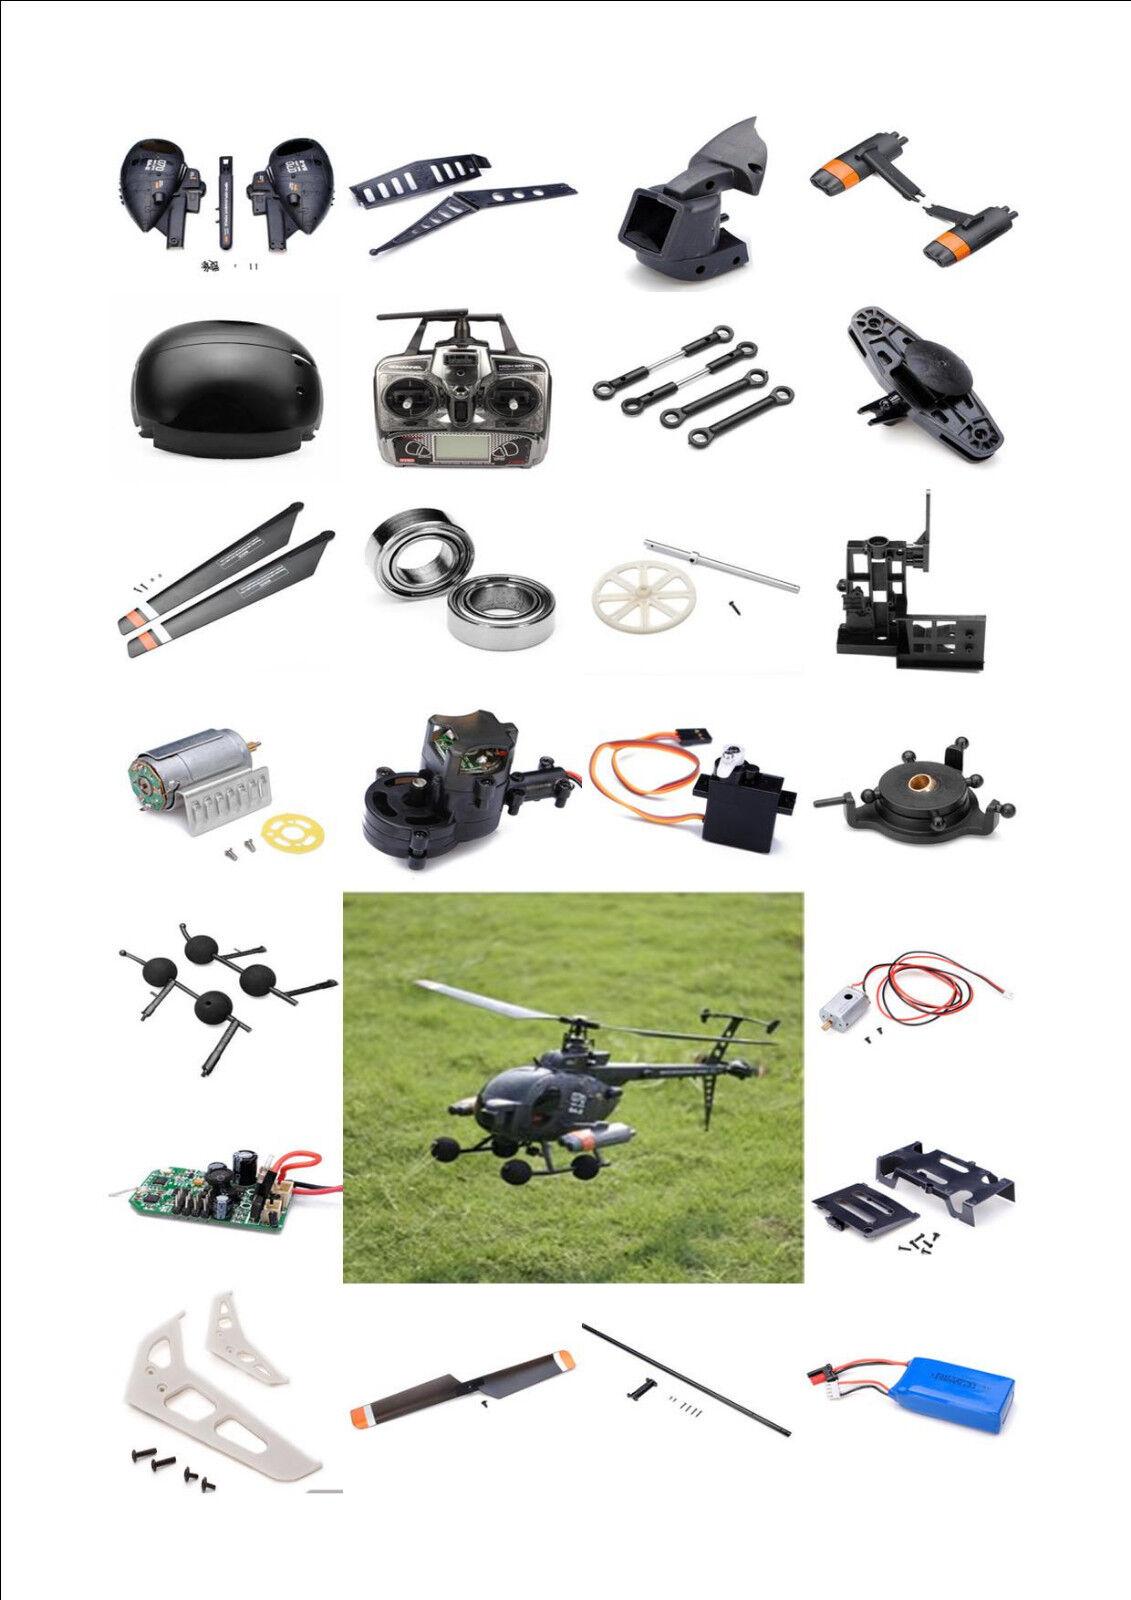 Ersatzteile FX070C FBL  Militär RC Helikopter 2,4GHz, Hubschrauber